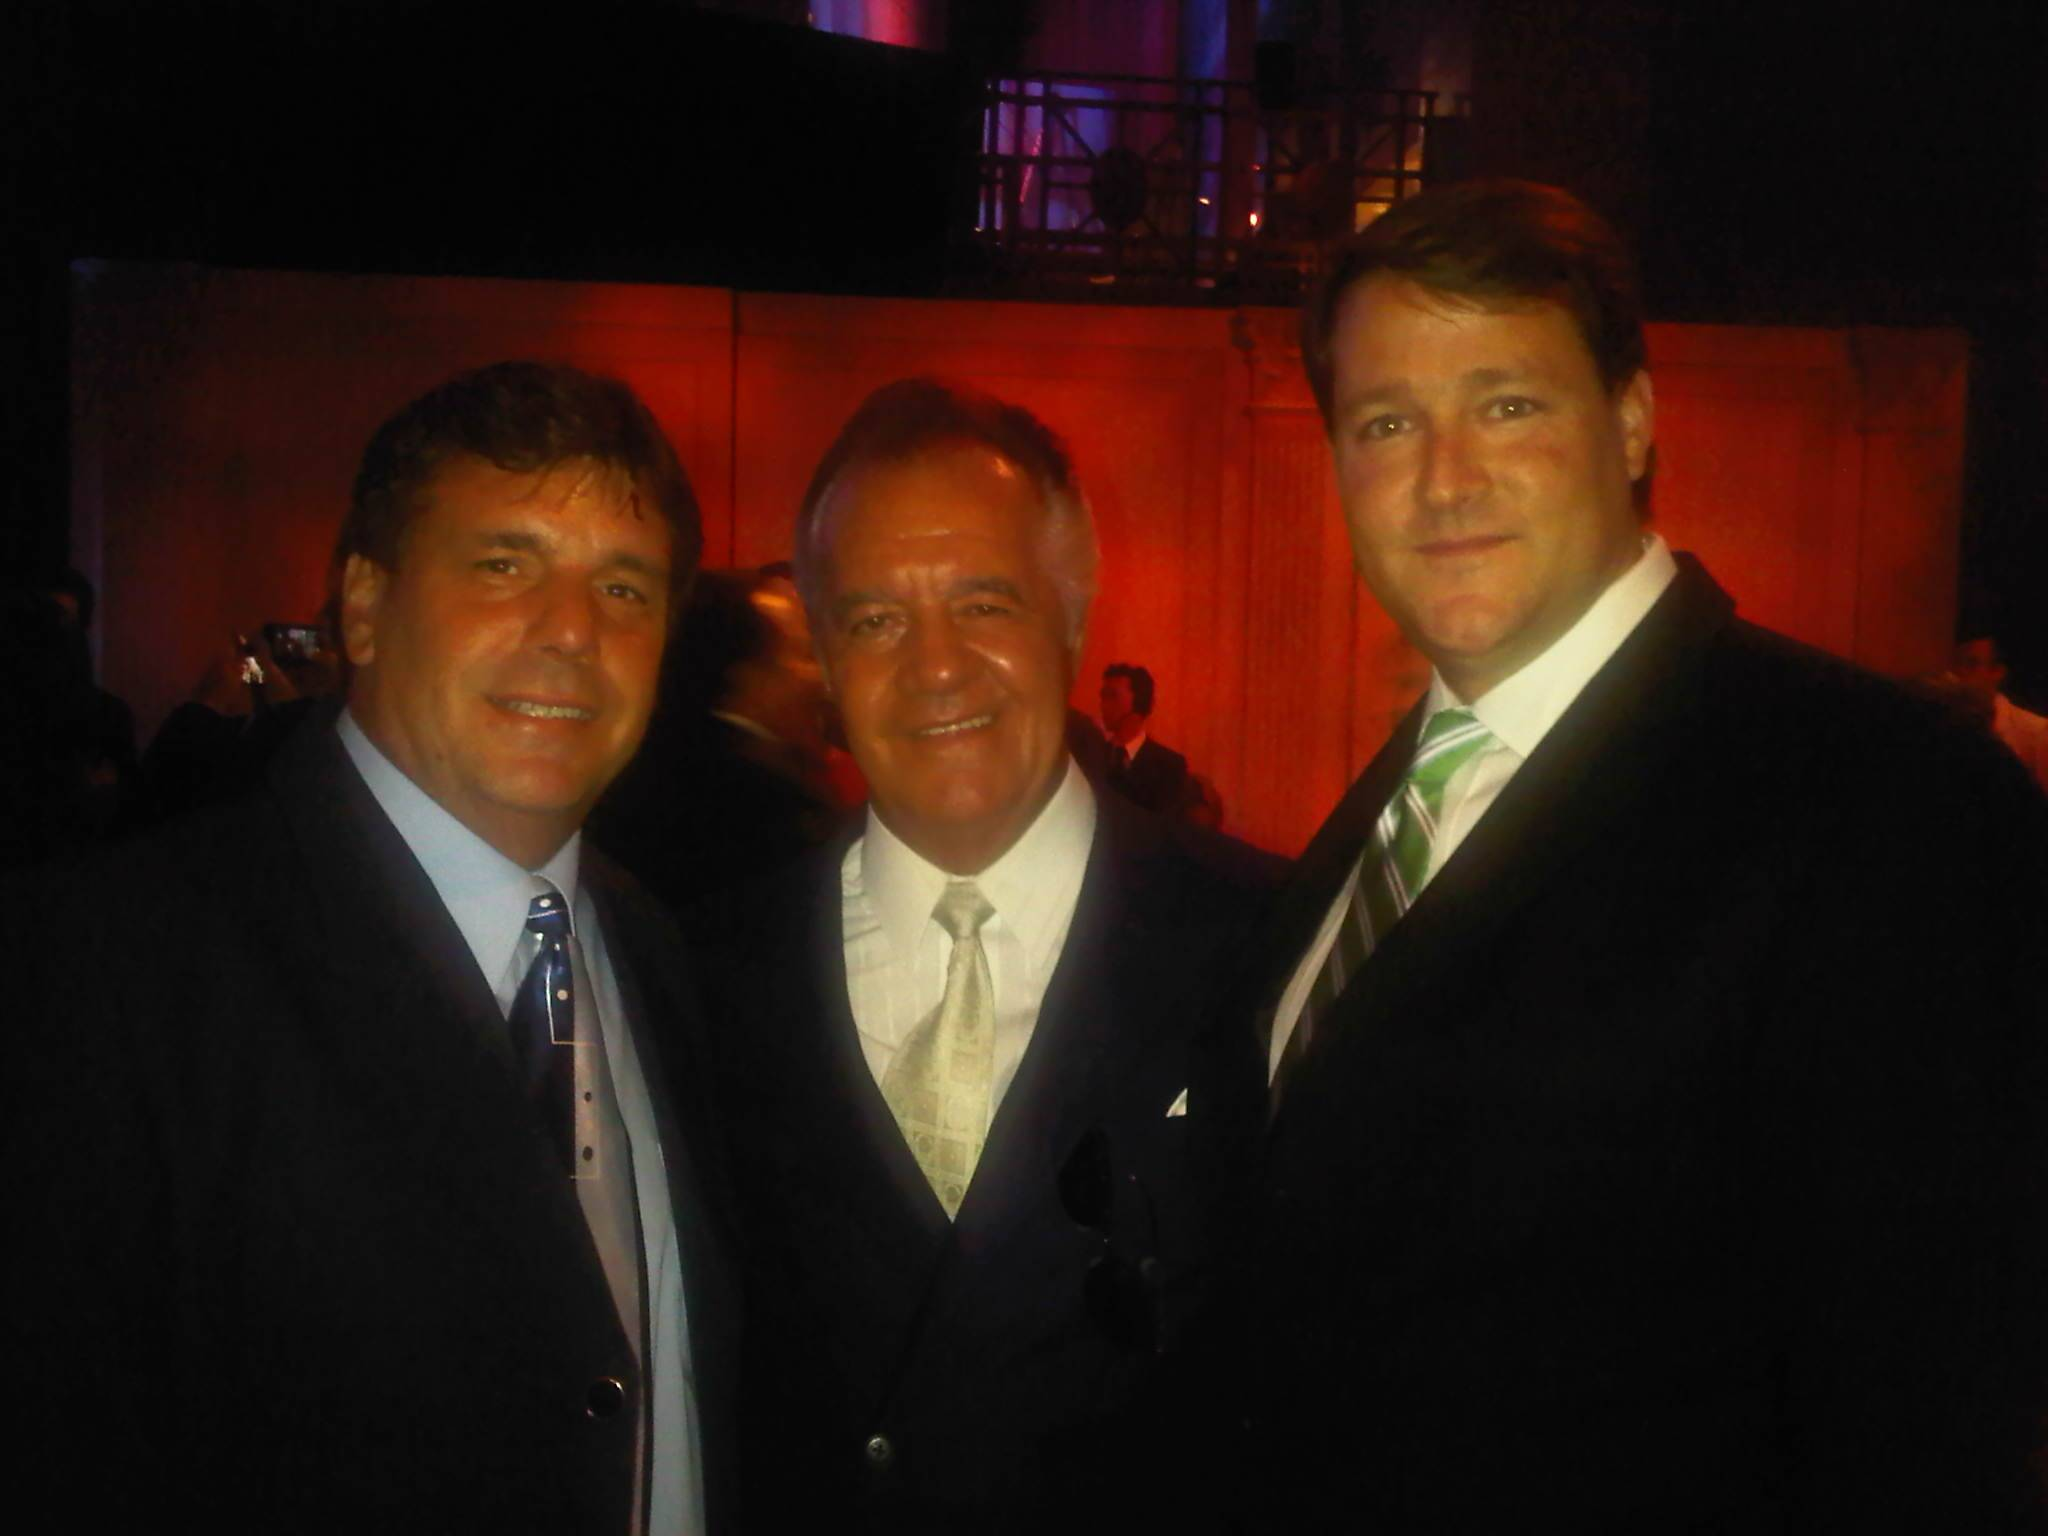 Chuck Aiesi & Sean Wolfington with star from Sopranos